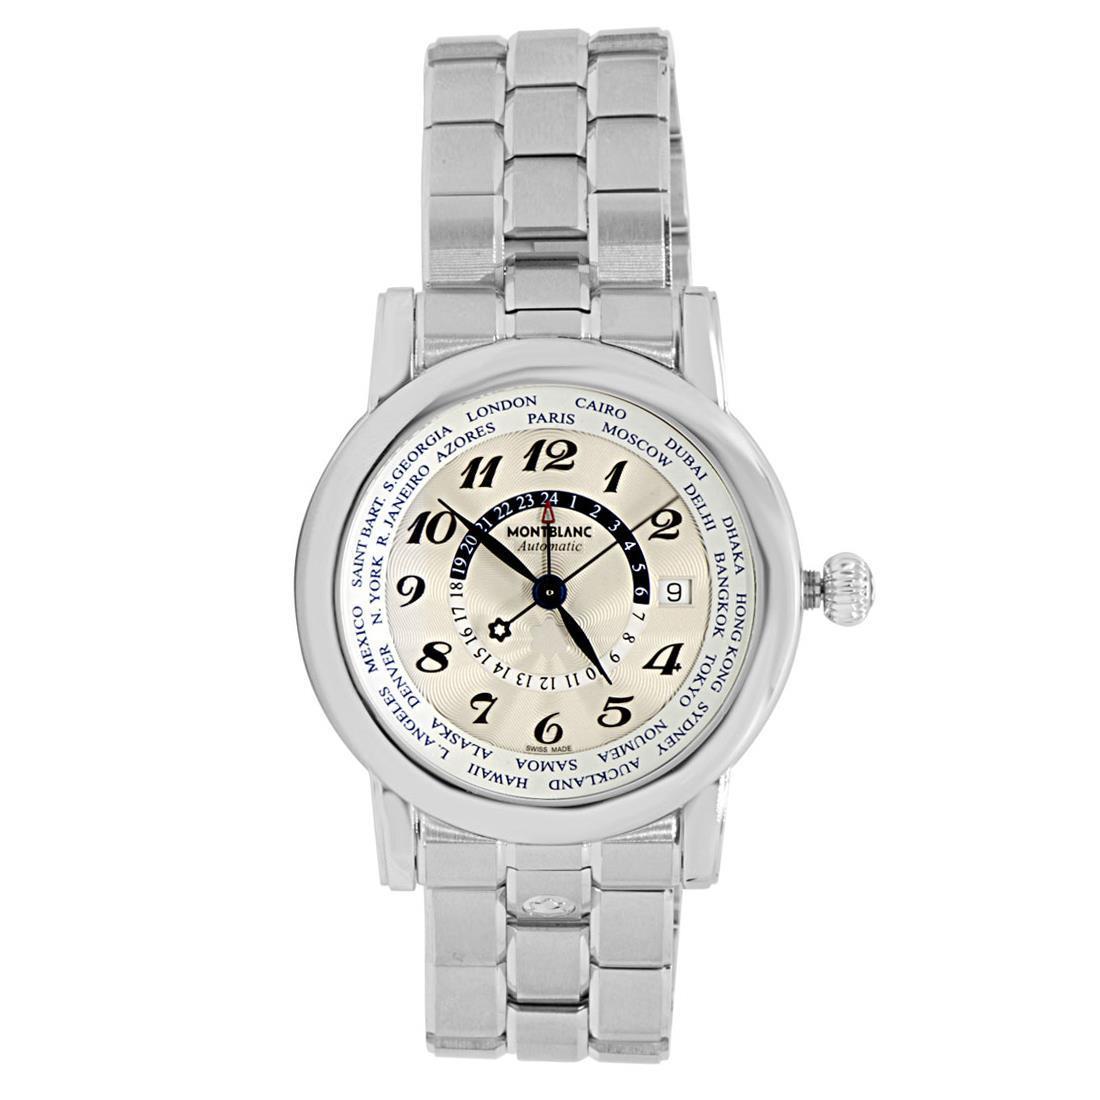 Orologio Montblanc STAR WORLD TIME GMT  - MONTBLANC